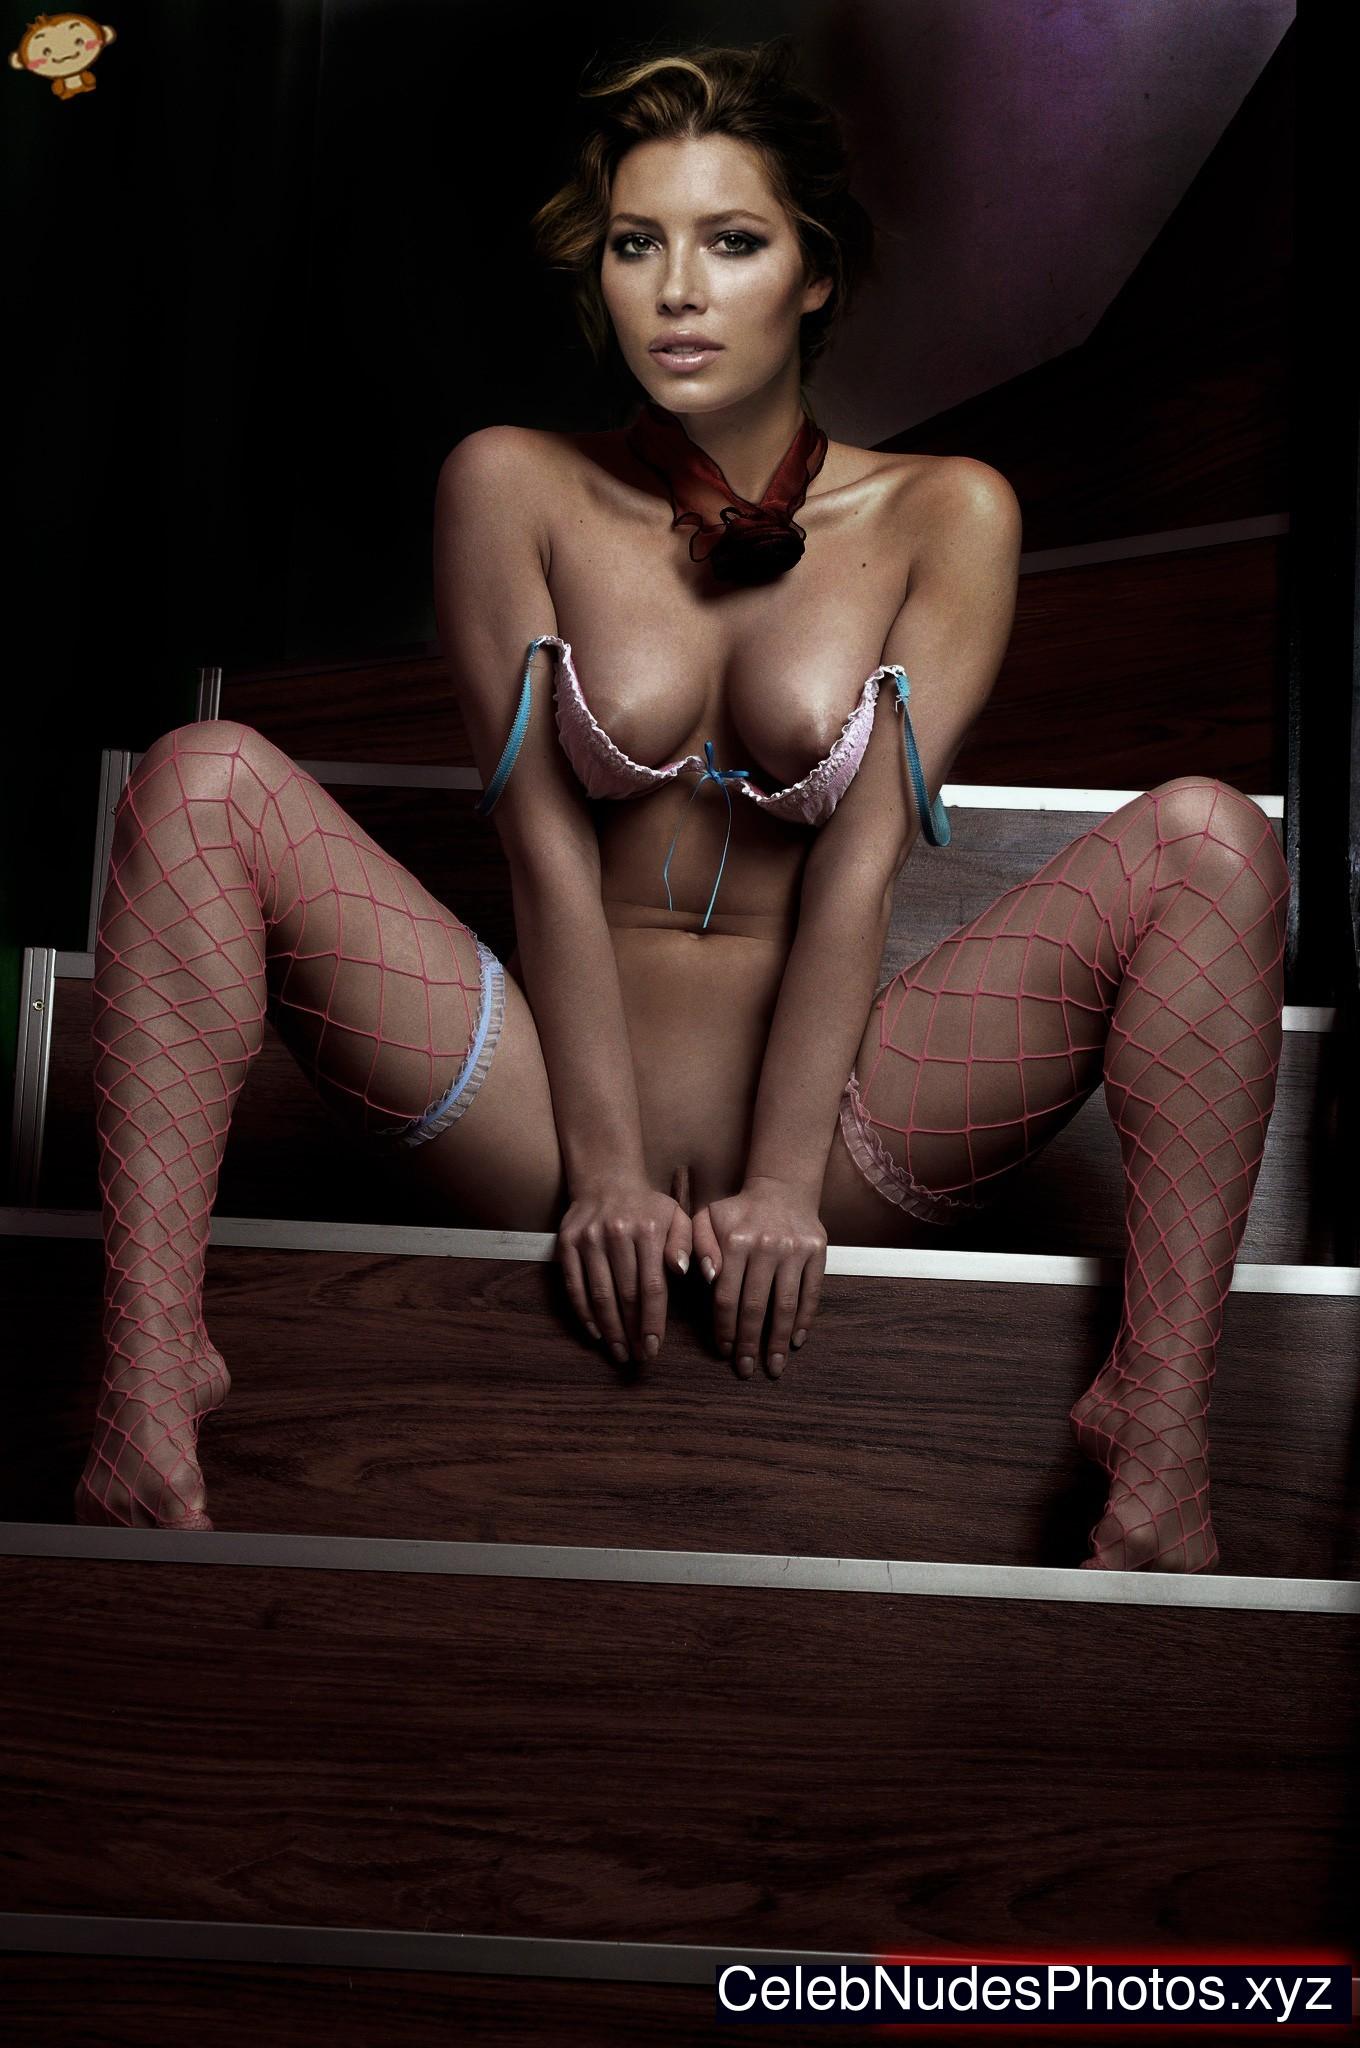 Jessica Biel Celebrities Naked sexy 4